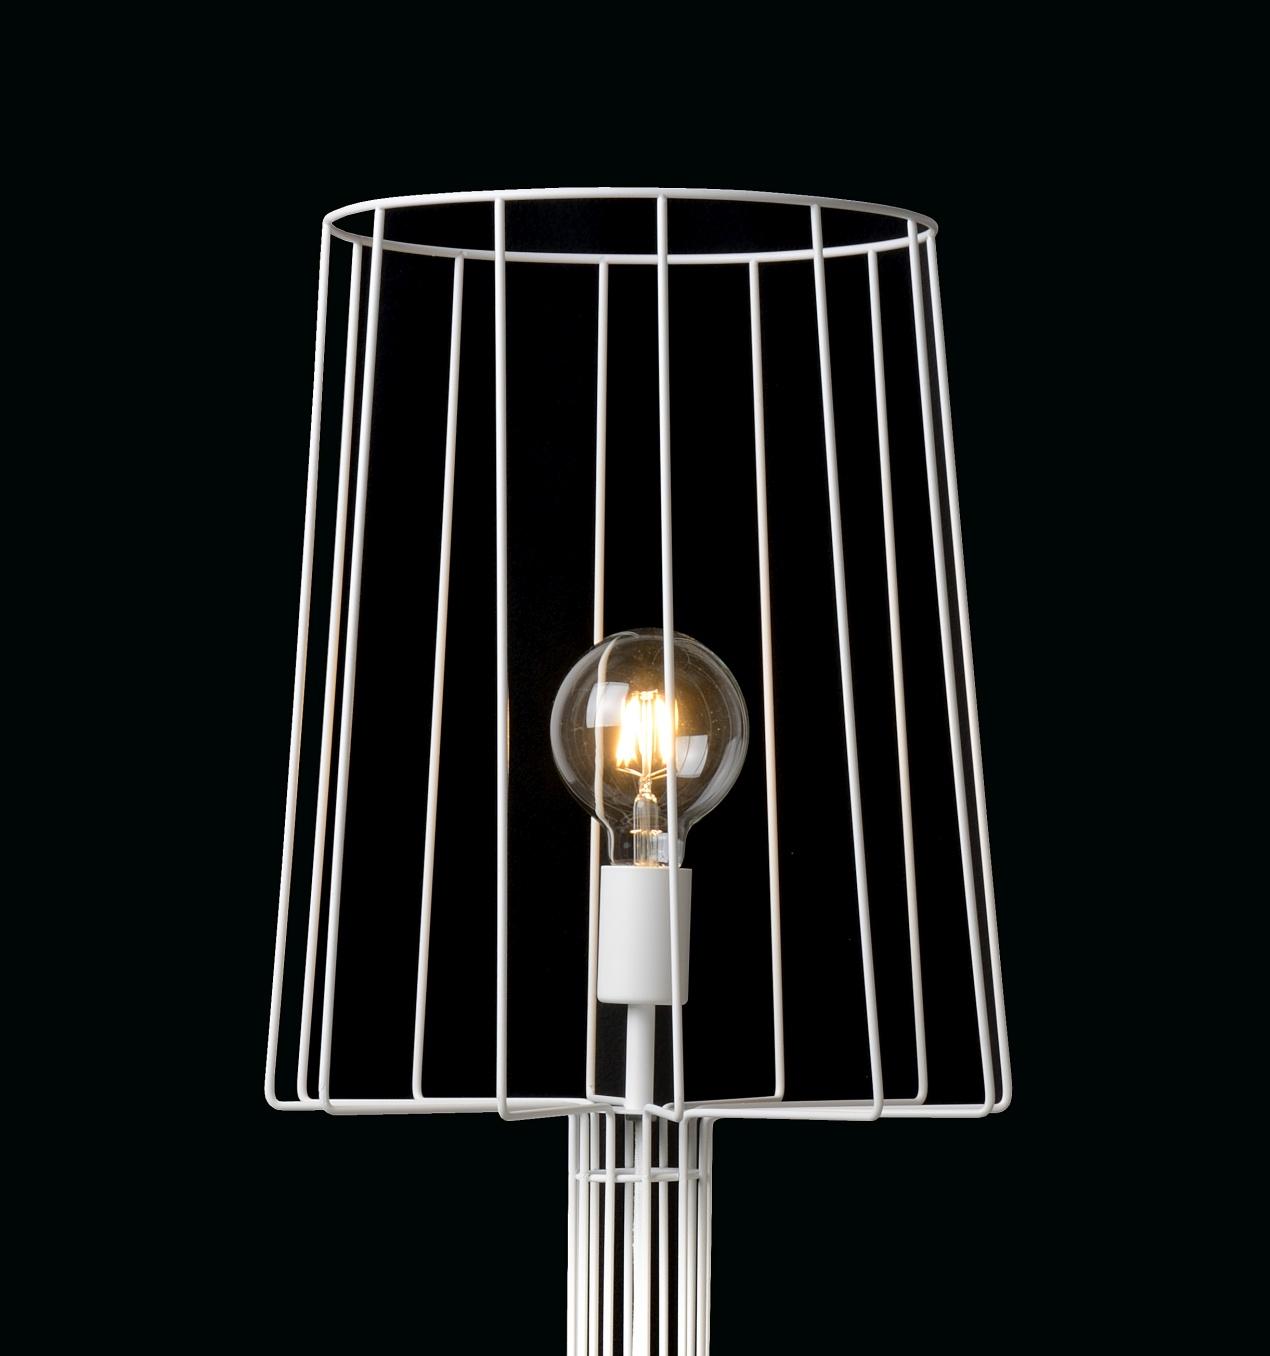 Lucide Vloerlamp Louis - H151 Cm - Wit